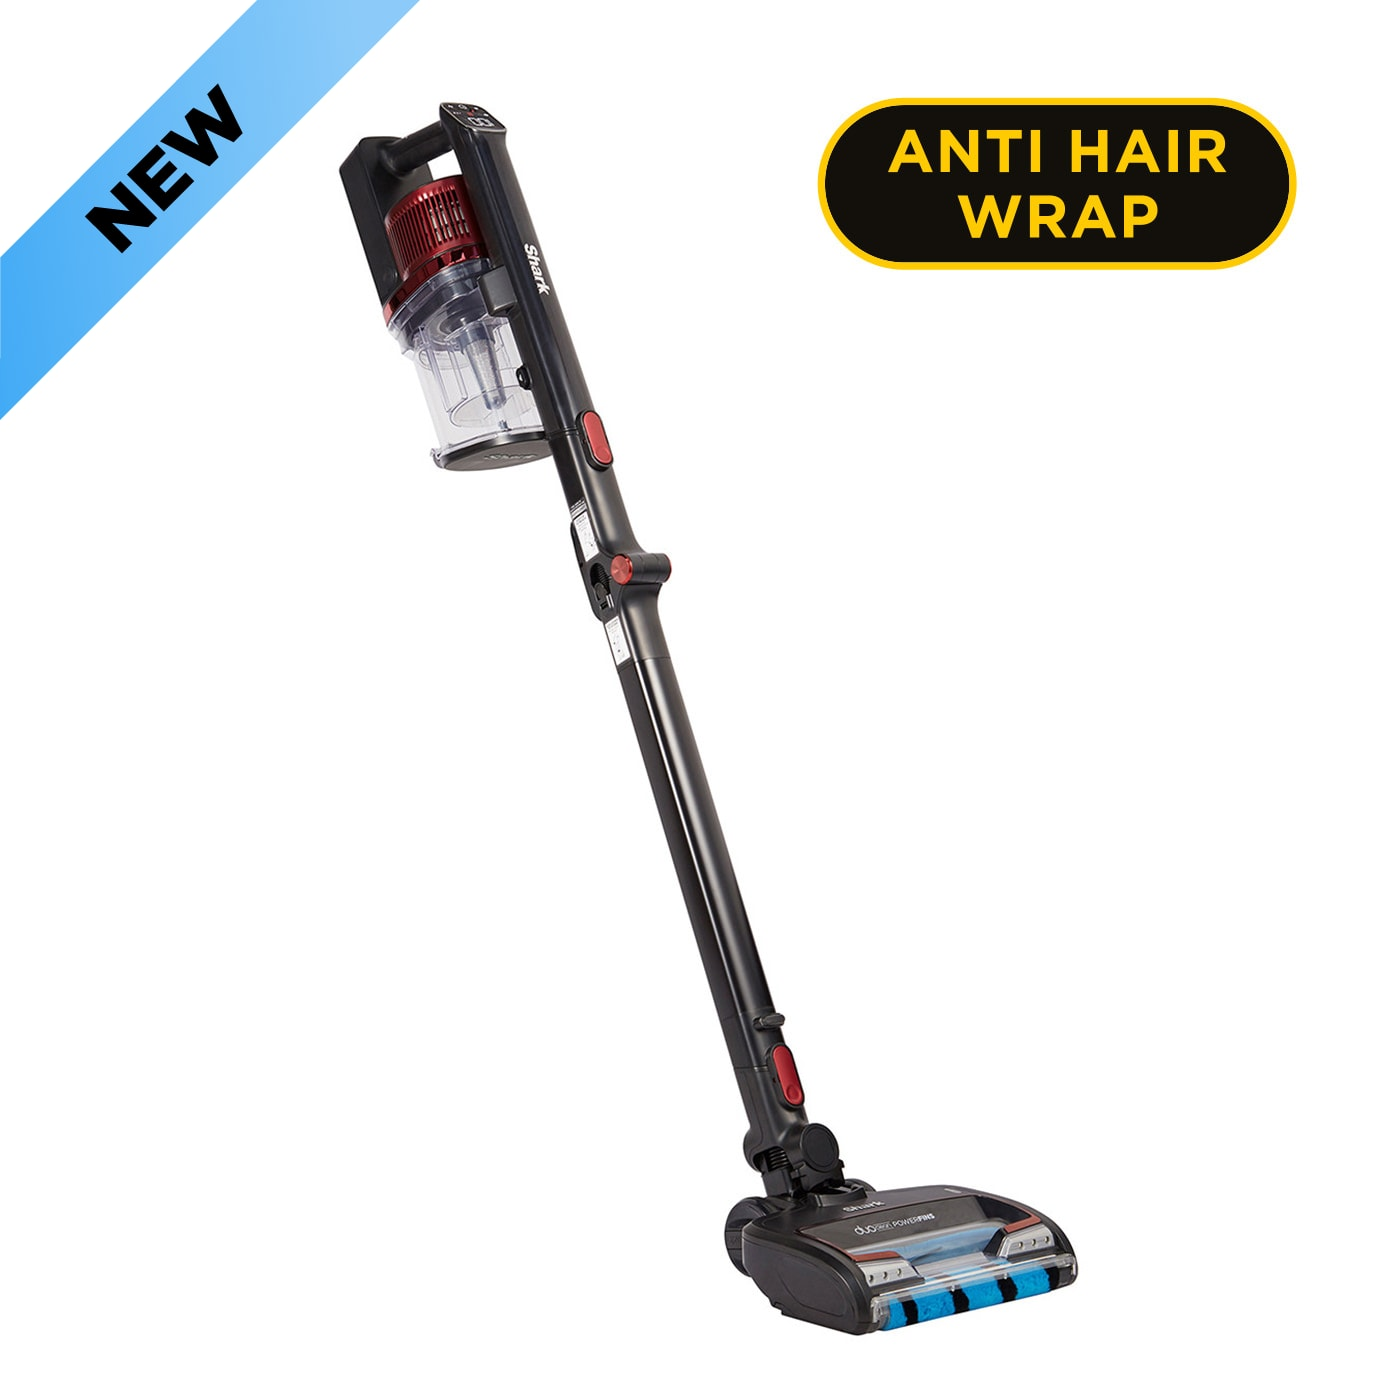 Shark Anti Hair Wrap Cordless Stick Vacuum Cleaner with PowerFins, Flexology & TruePet [Single Battery] IZ300UKT product photo